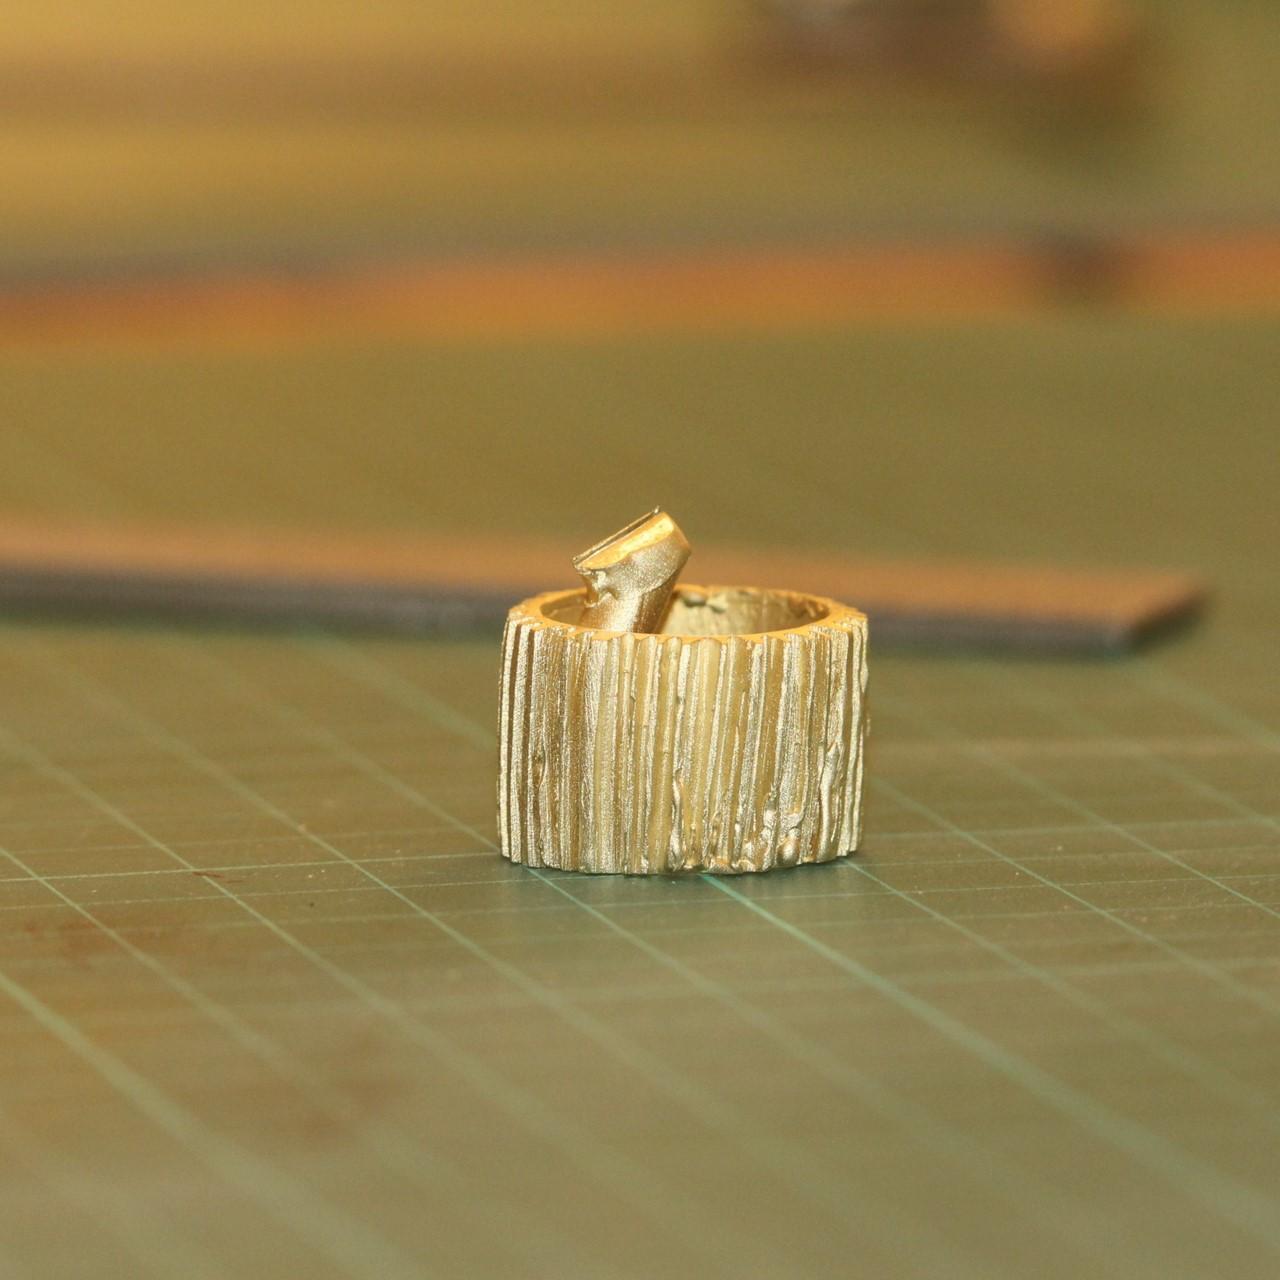 Transformation de la cire en métal après fonte